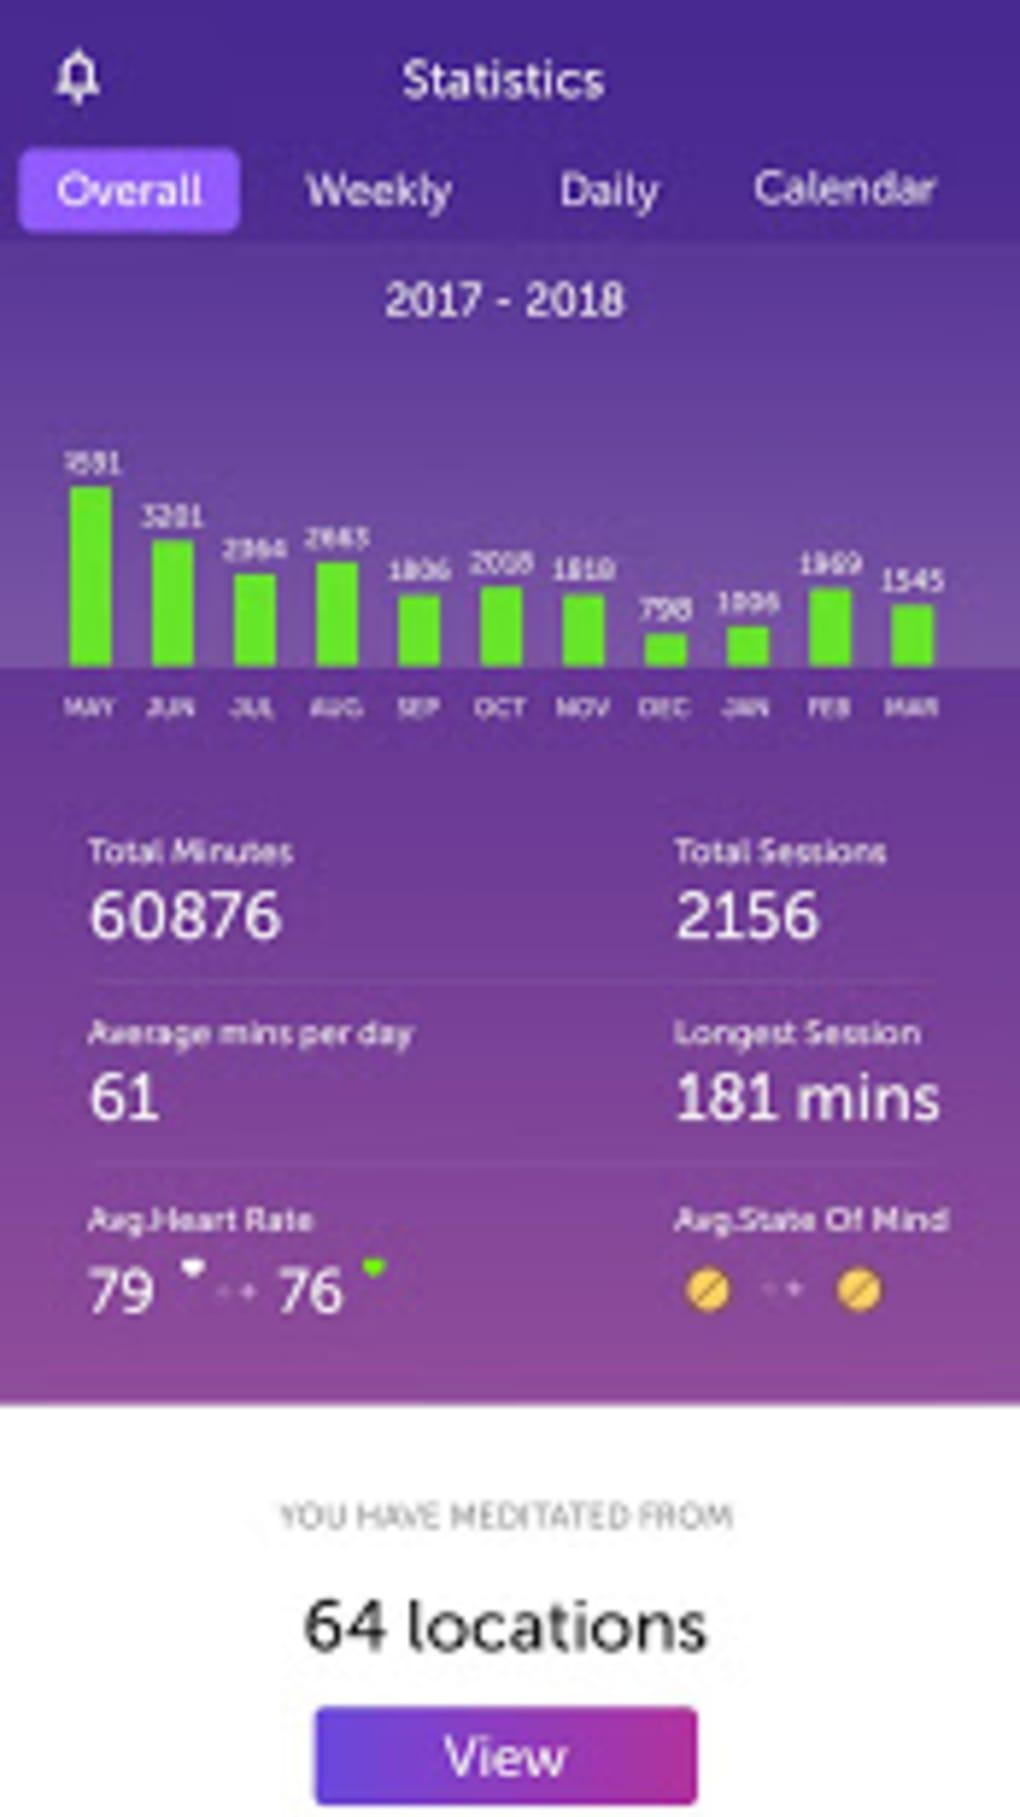 Sattva - Meditation App for Android - Download